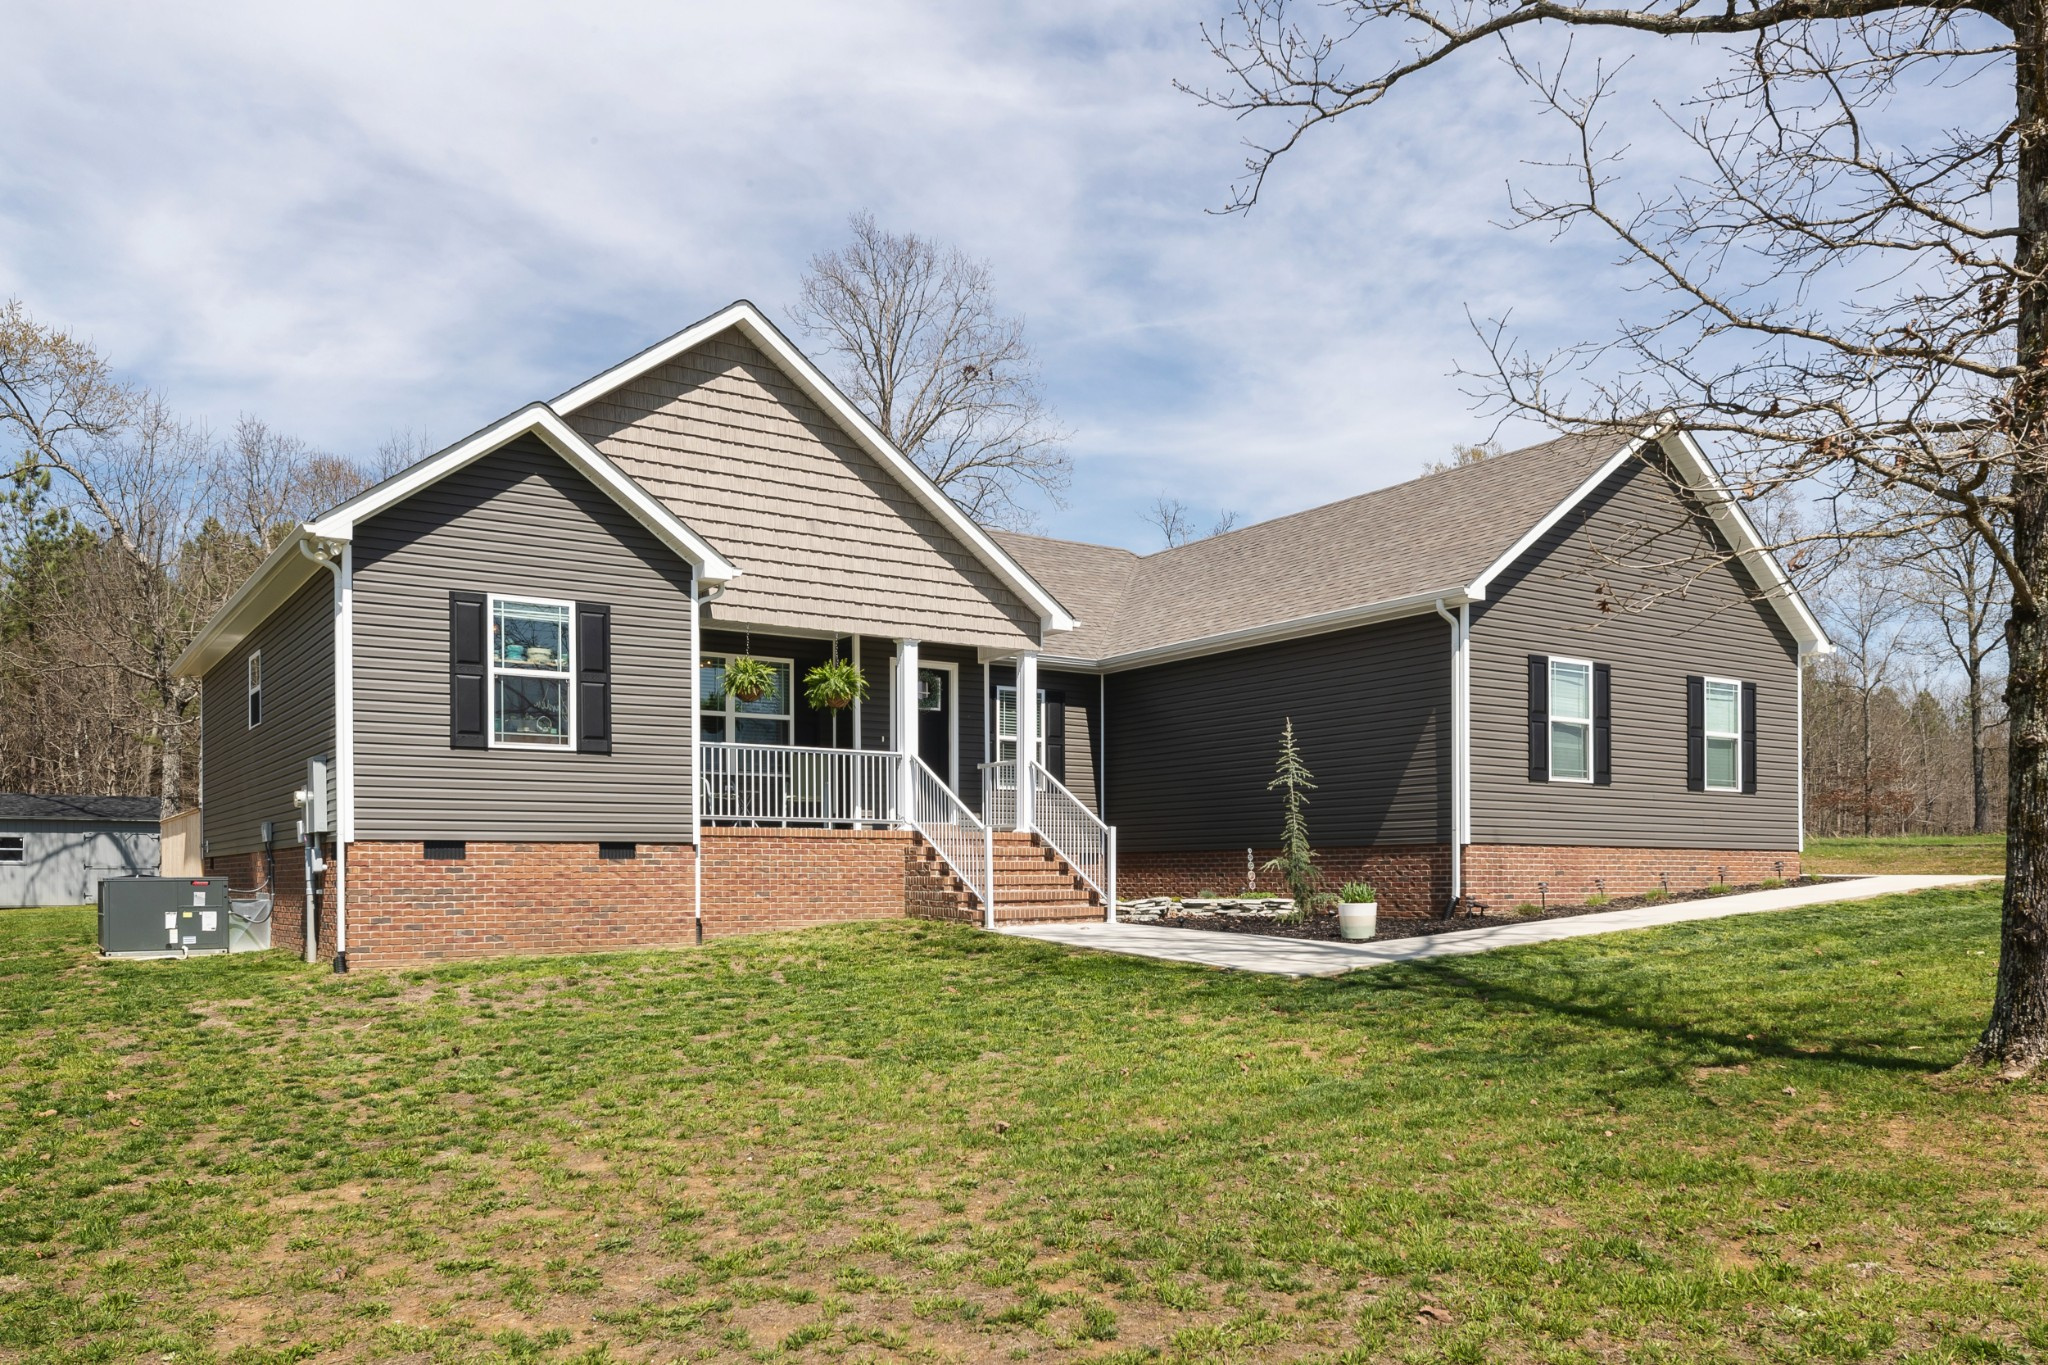 441 Presley Cir, Mount Pleasant, TN 38474 - Mount Pleasant, TN real estate listing